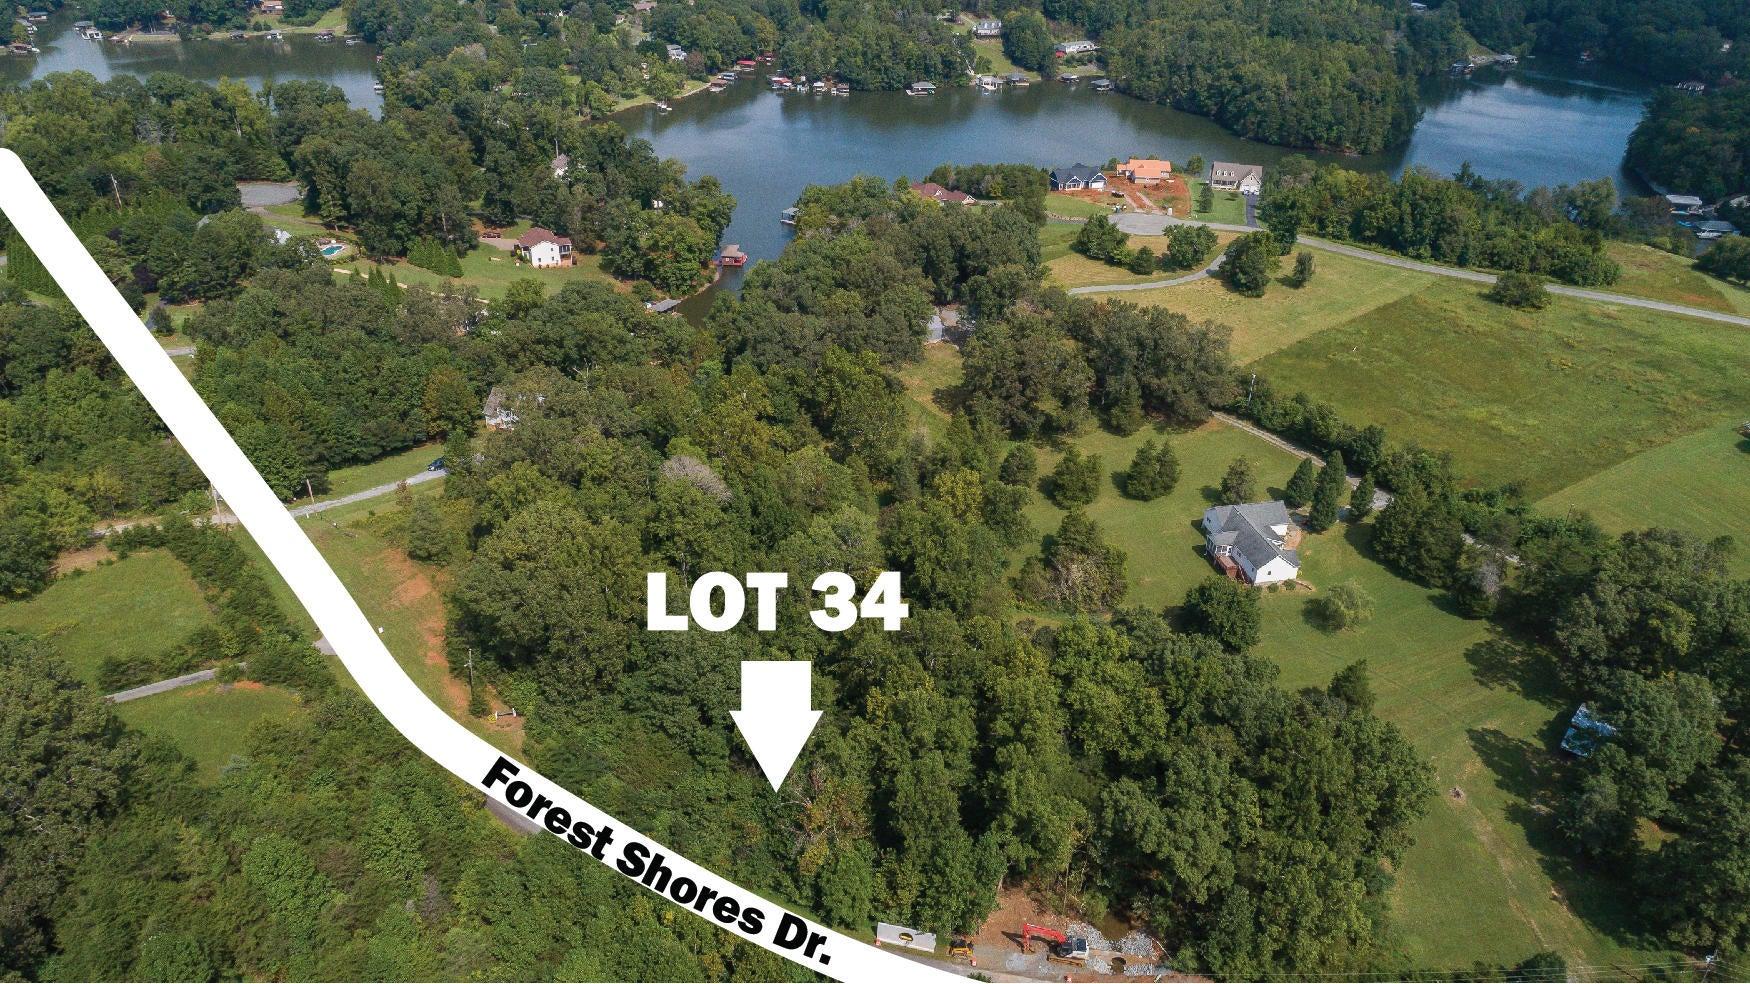 LOT 34 FOREST SHORES RD, Wirtz, VA 24184